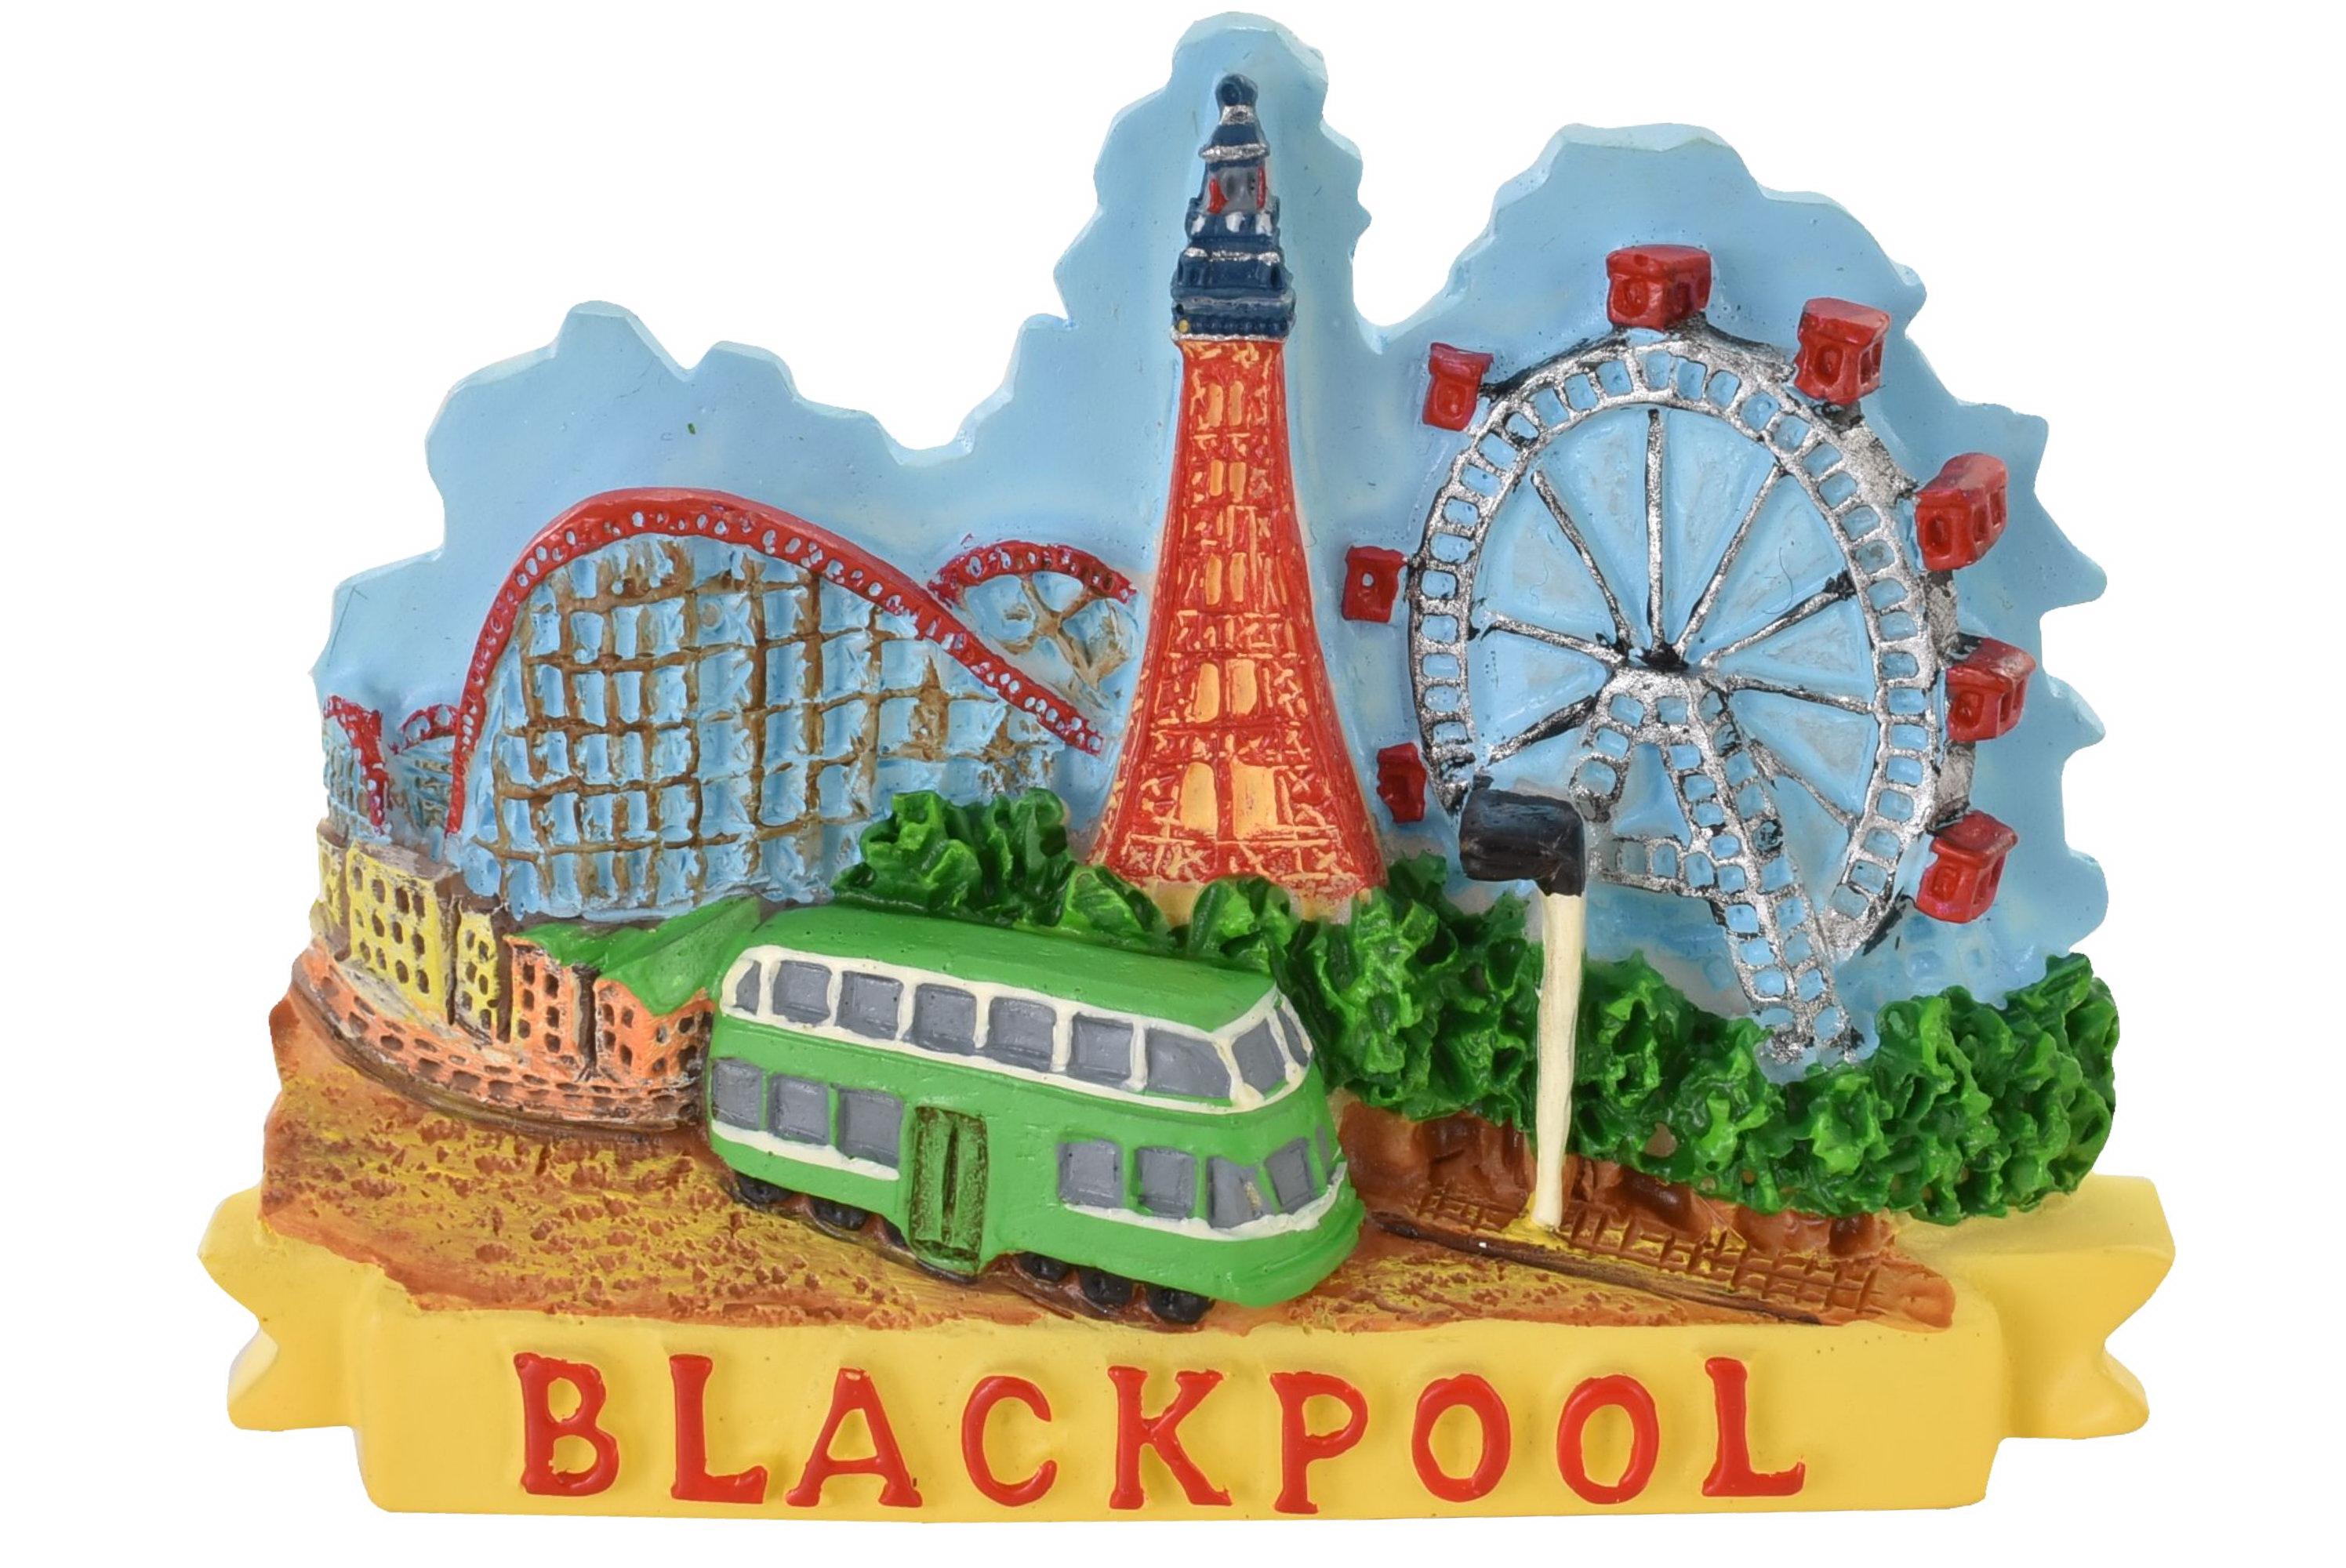 Blackpool Resin Magnet Tower/Tram/Wheel/Coaster